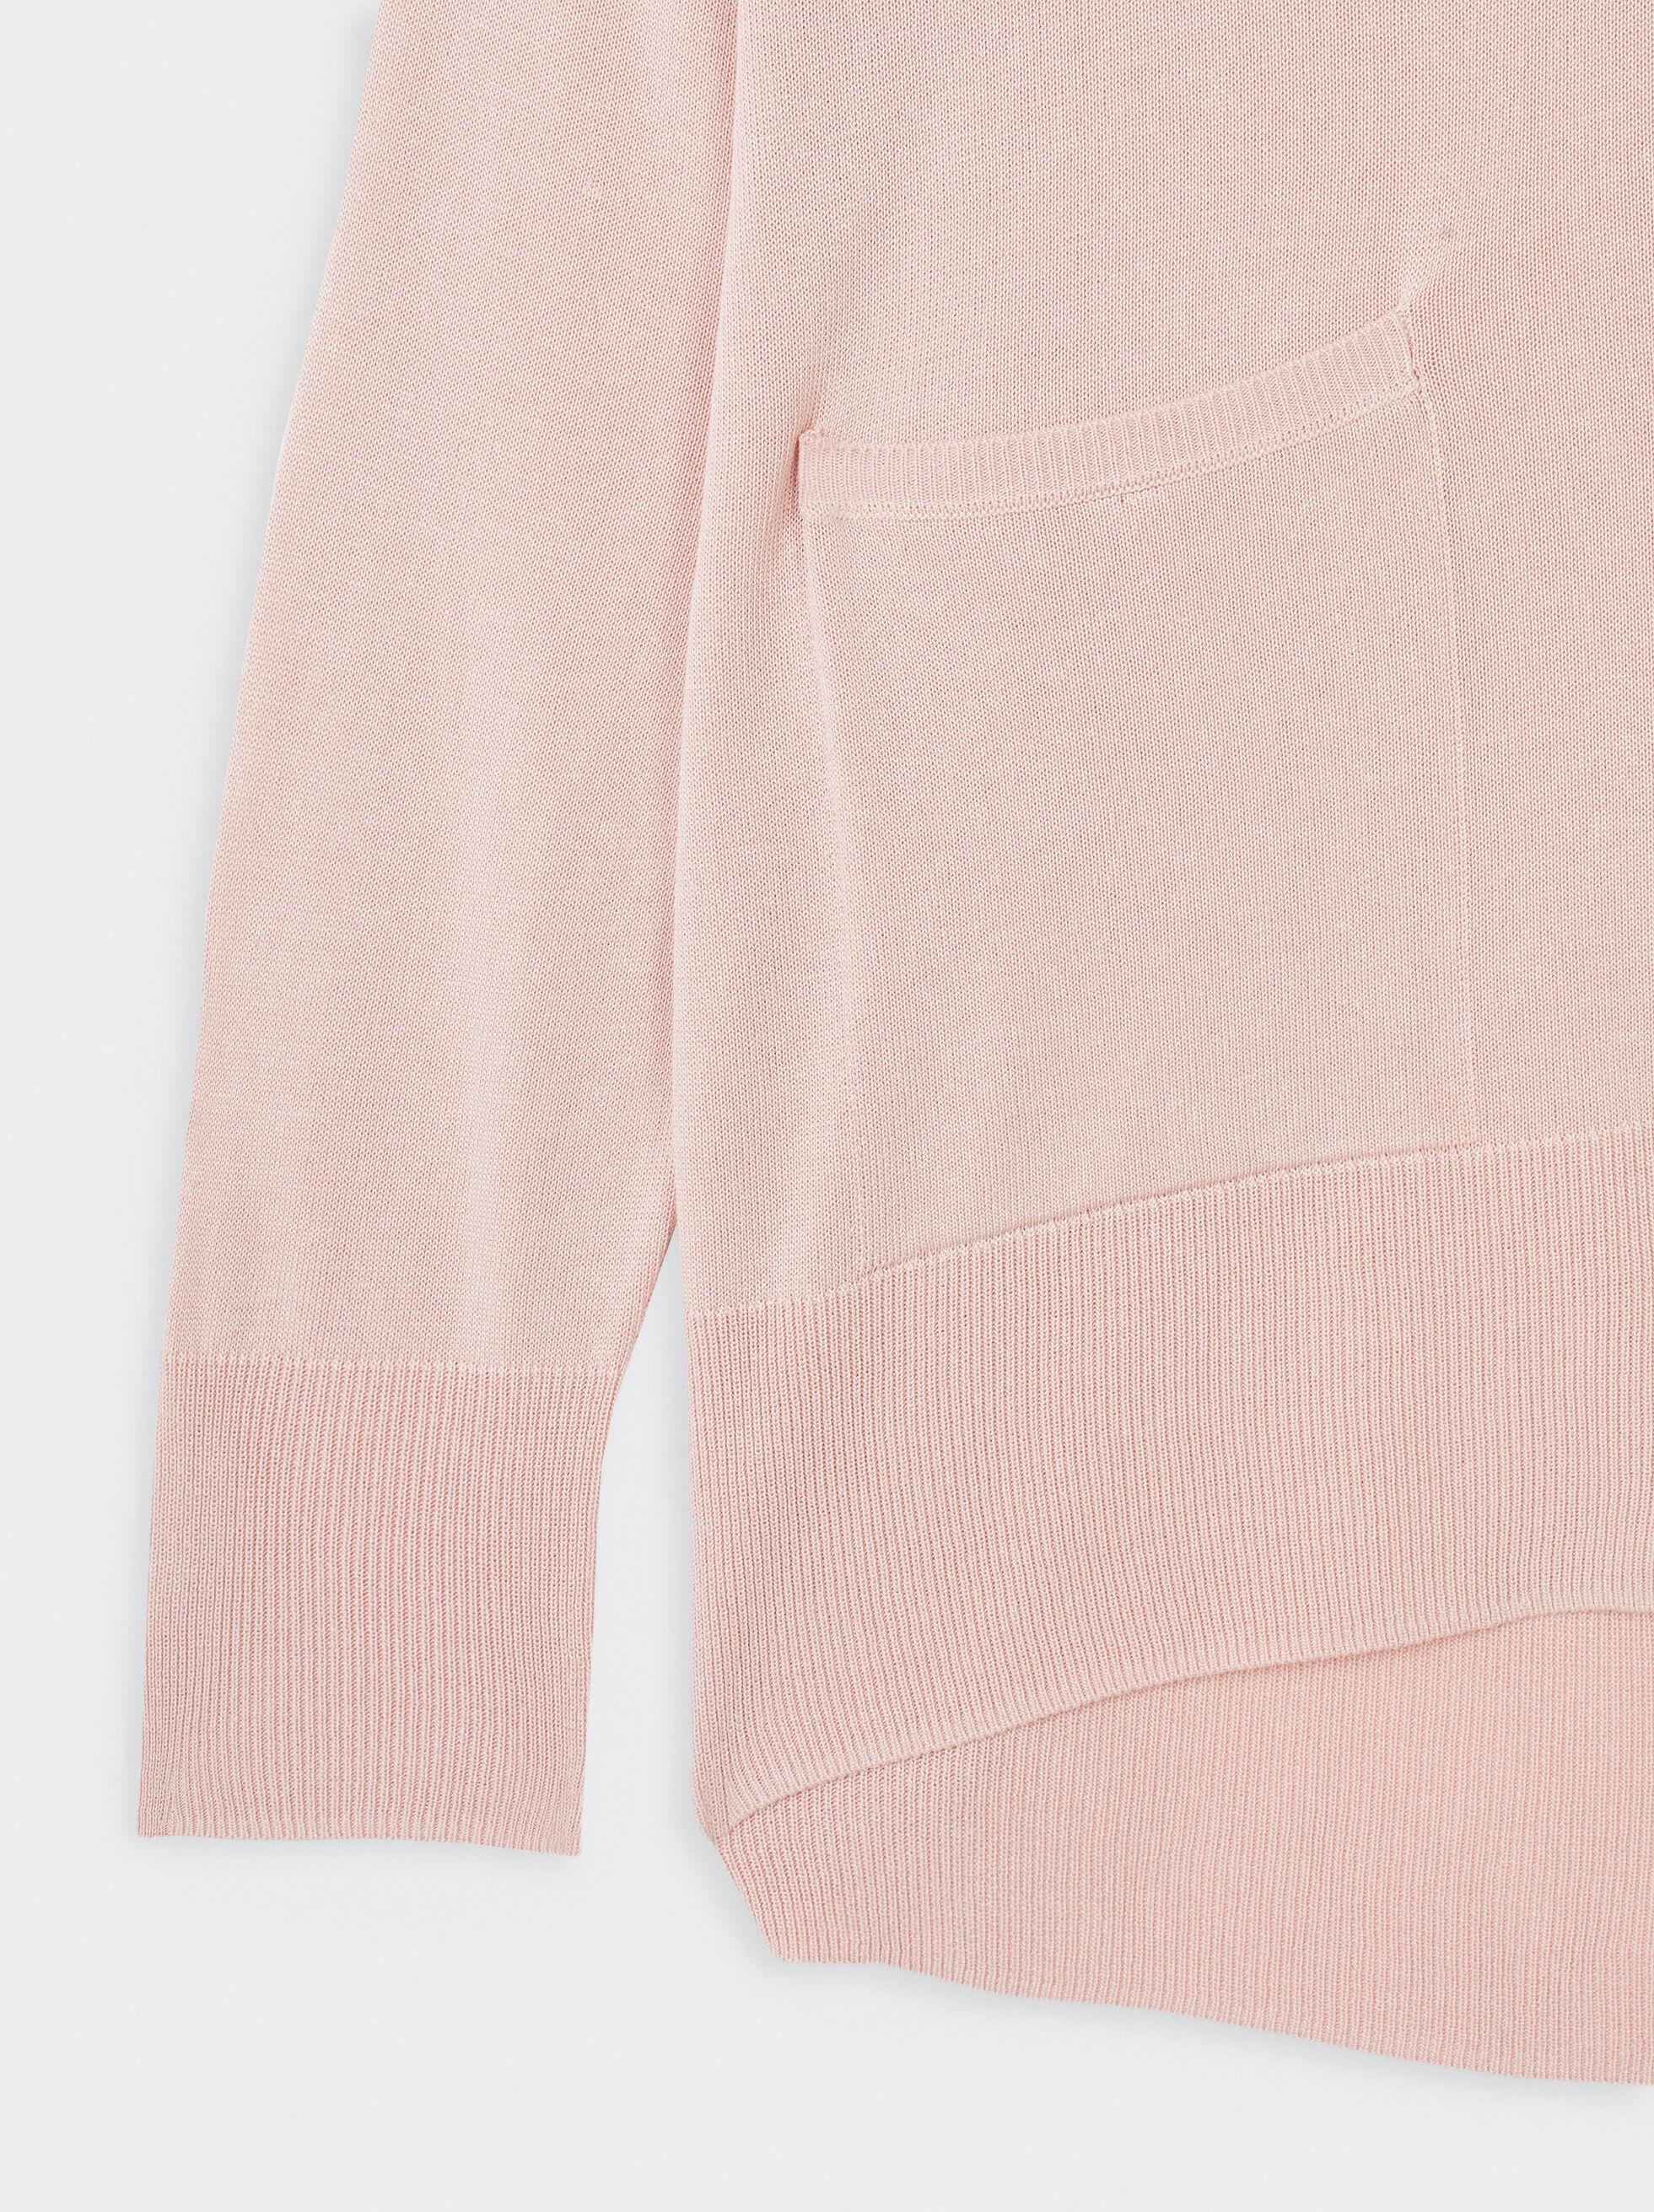 Knit Cardigan, Pink, hi-res